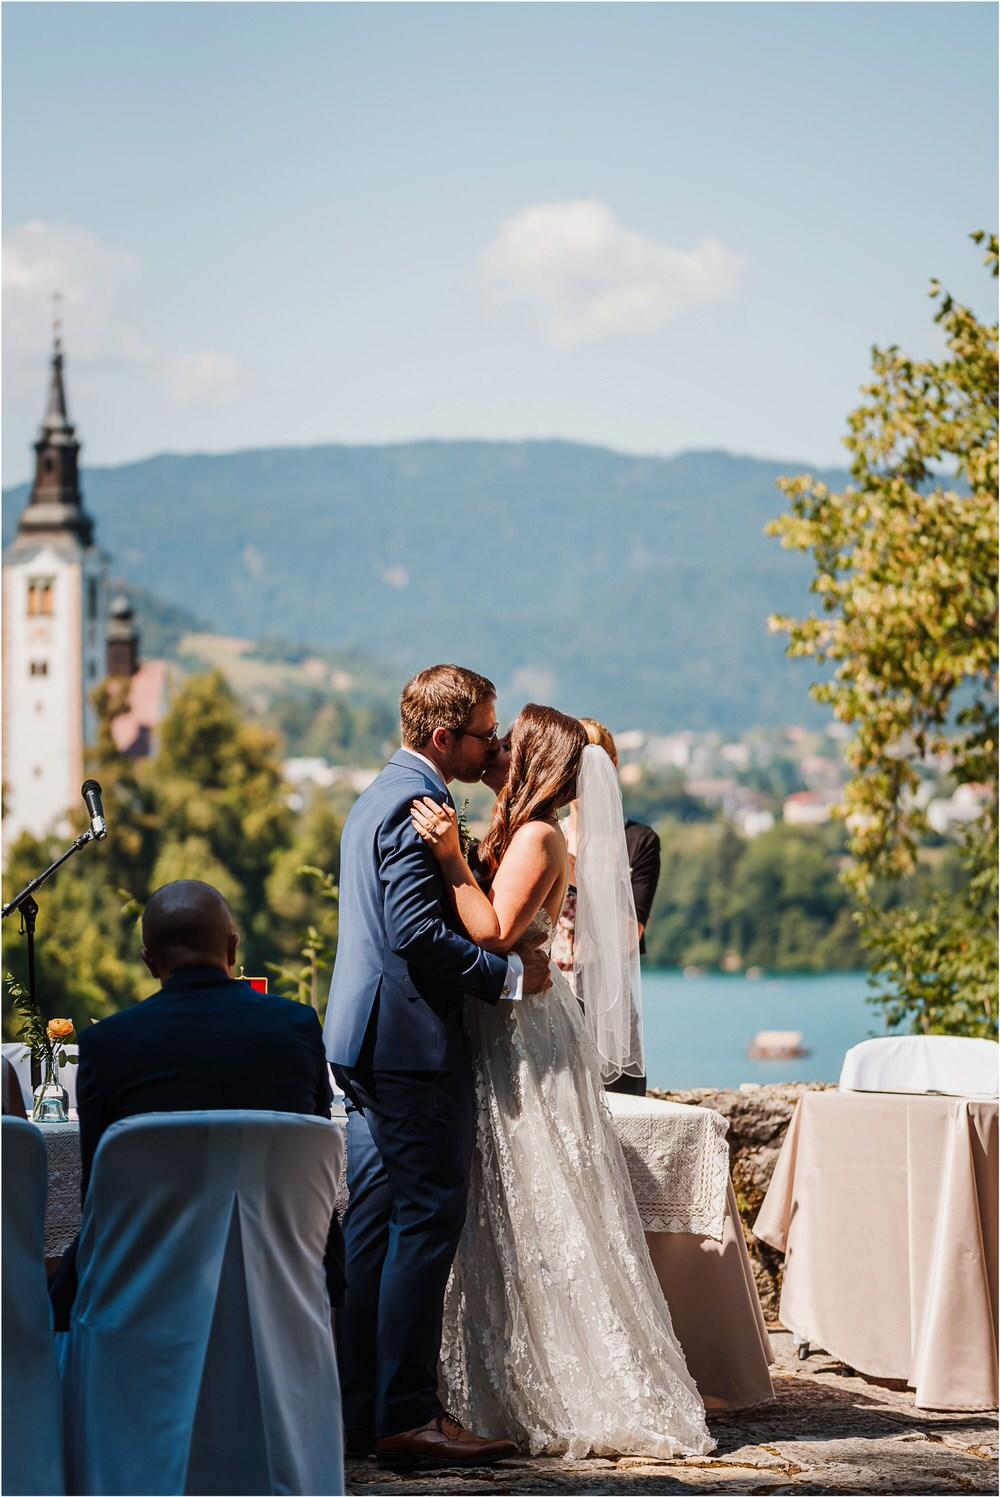 lake bled slovenia wedding vila bled sanjski sopek bled castle ceremony outdoor romantic wedding photographer photography natural candid bright 0058.jpg